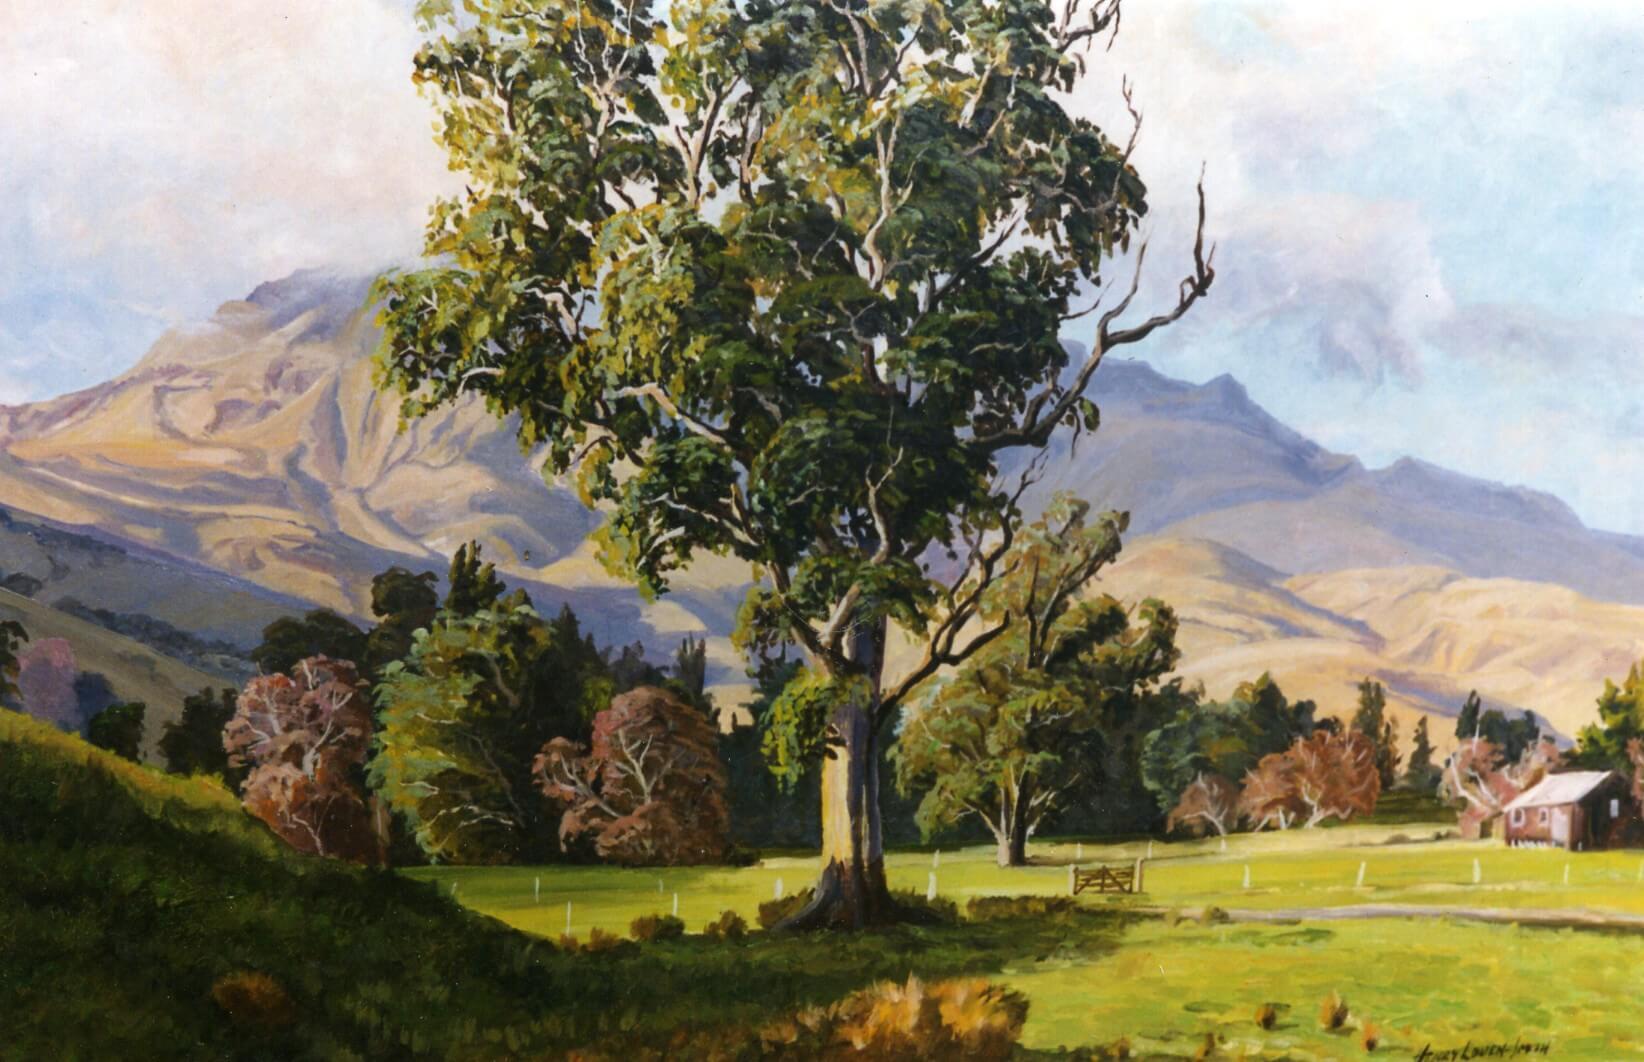 Mount Herbert Teddington Banks Peminsula